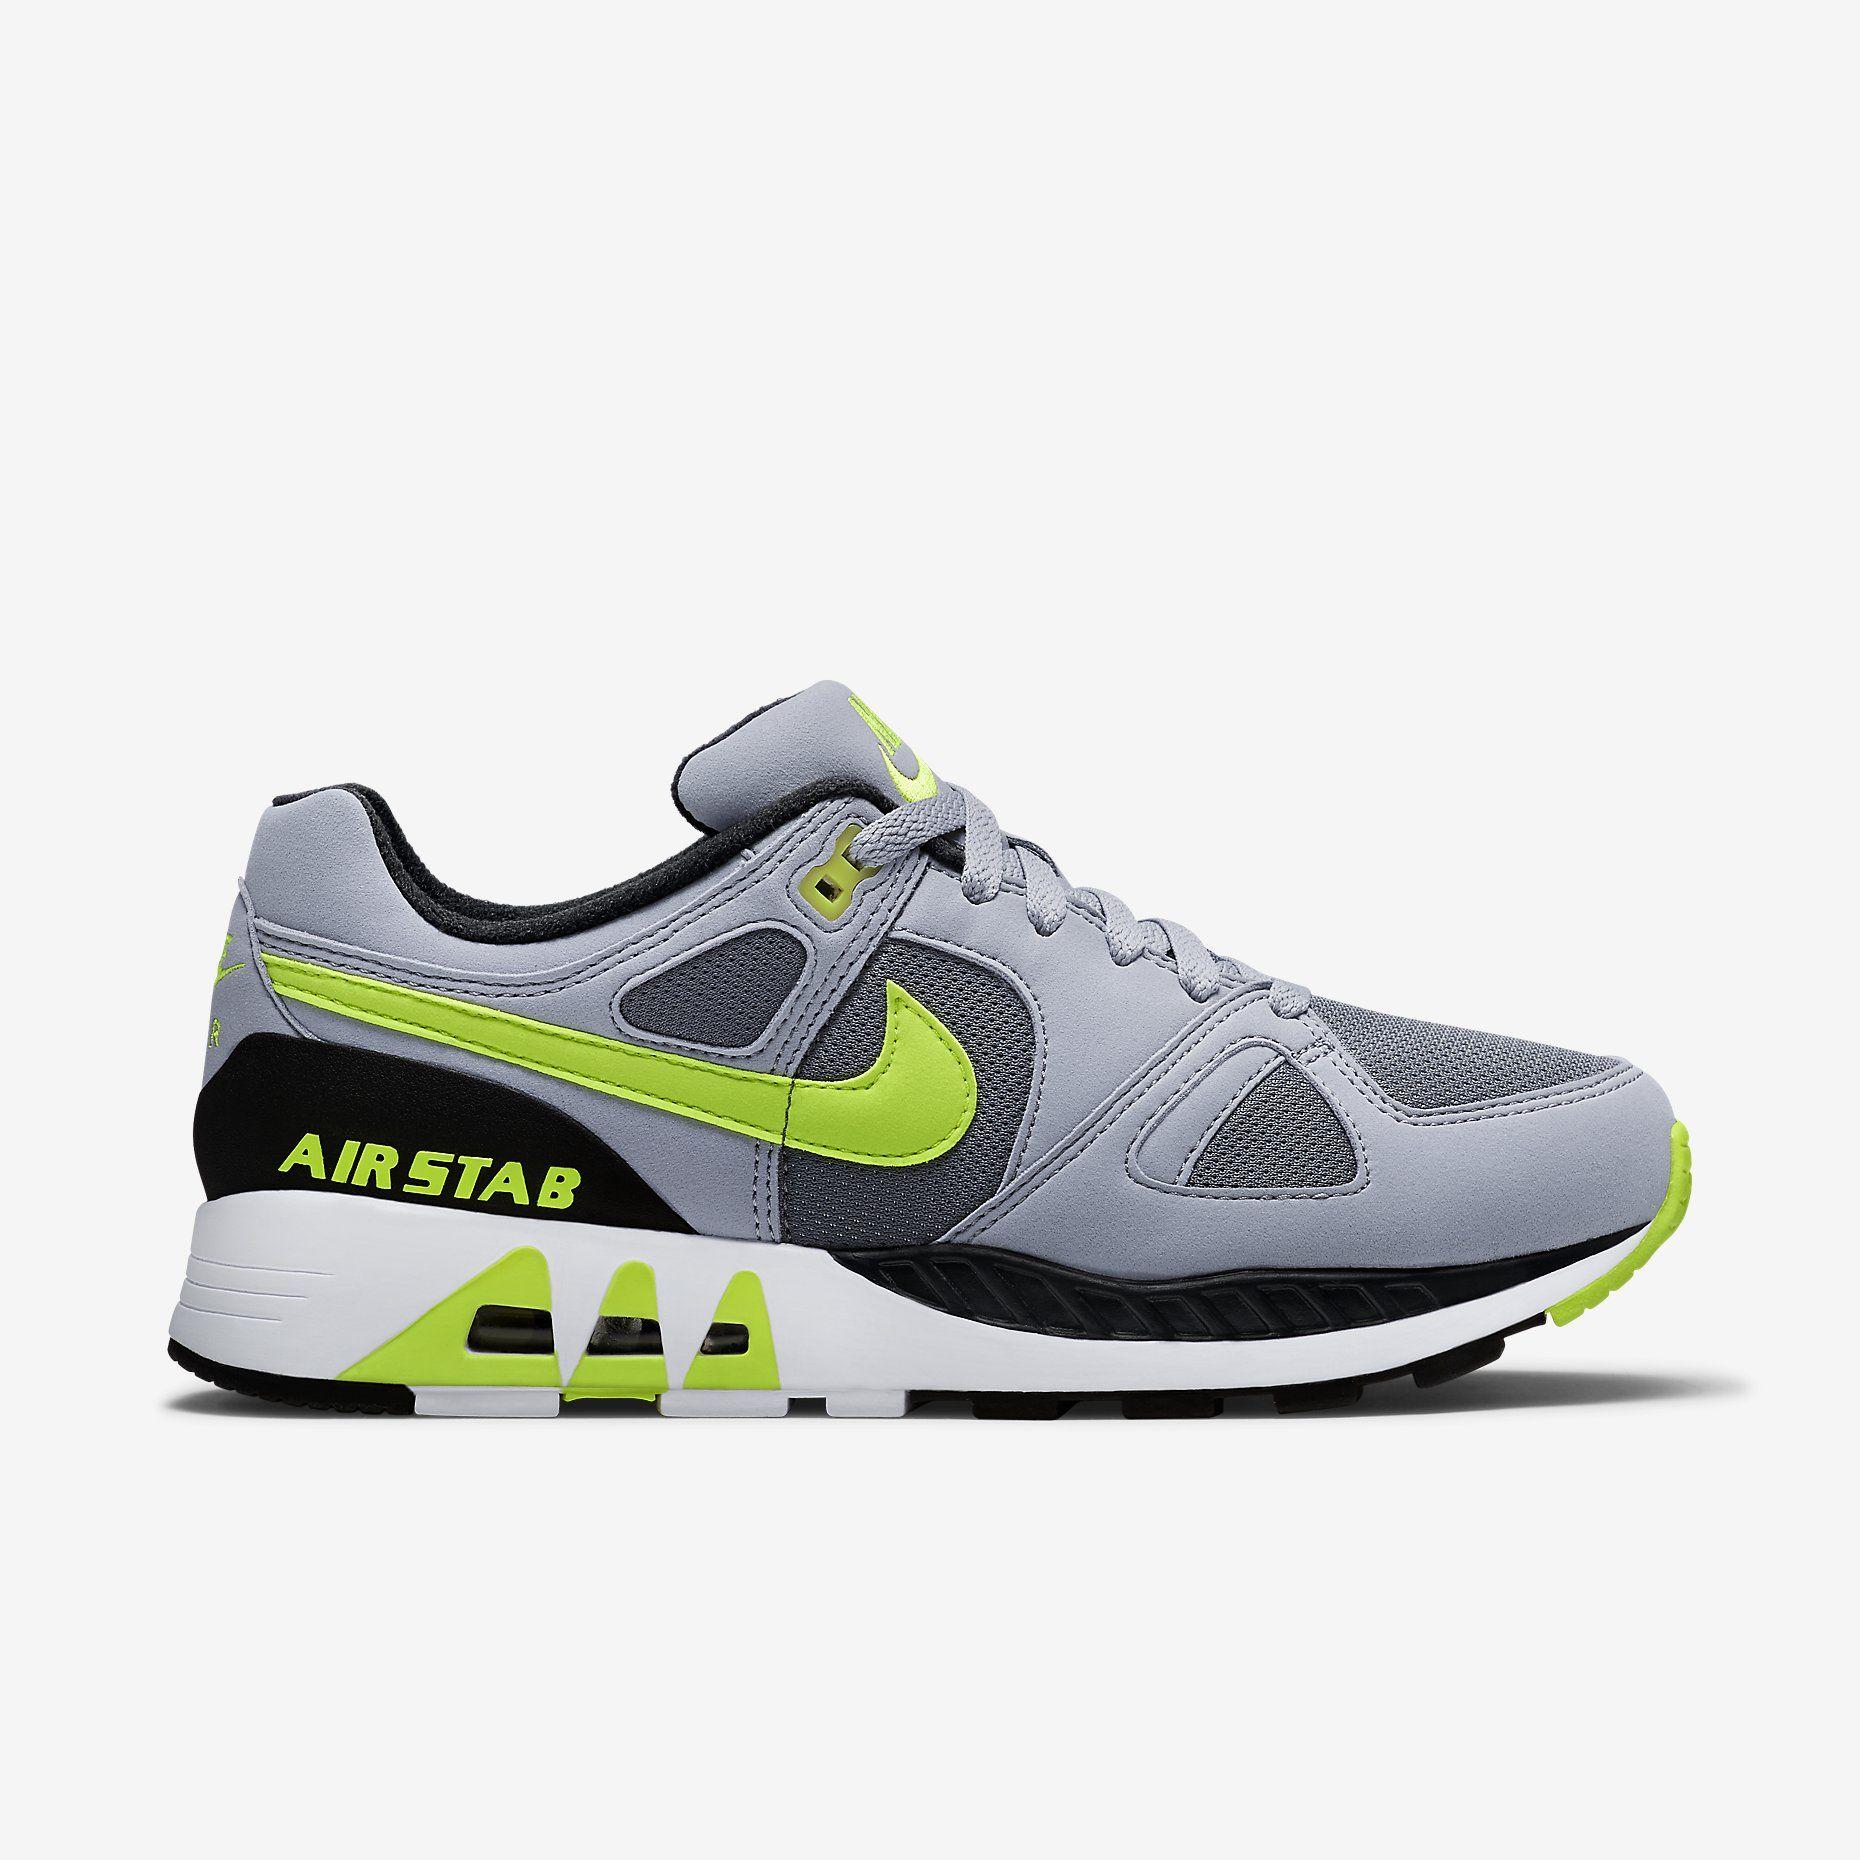 hot sale online 8da98 33c66 Nike Air Stab – Chaussure pour Homme. Nike Store FR